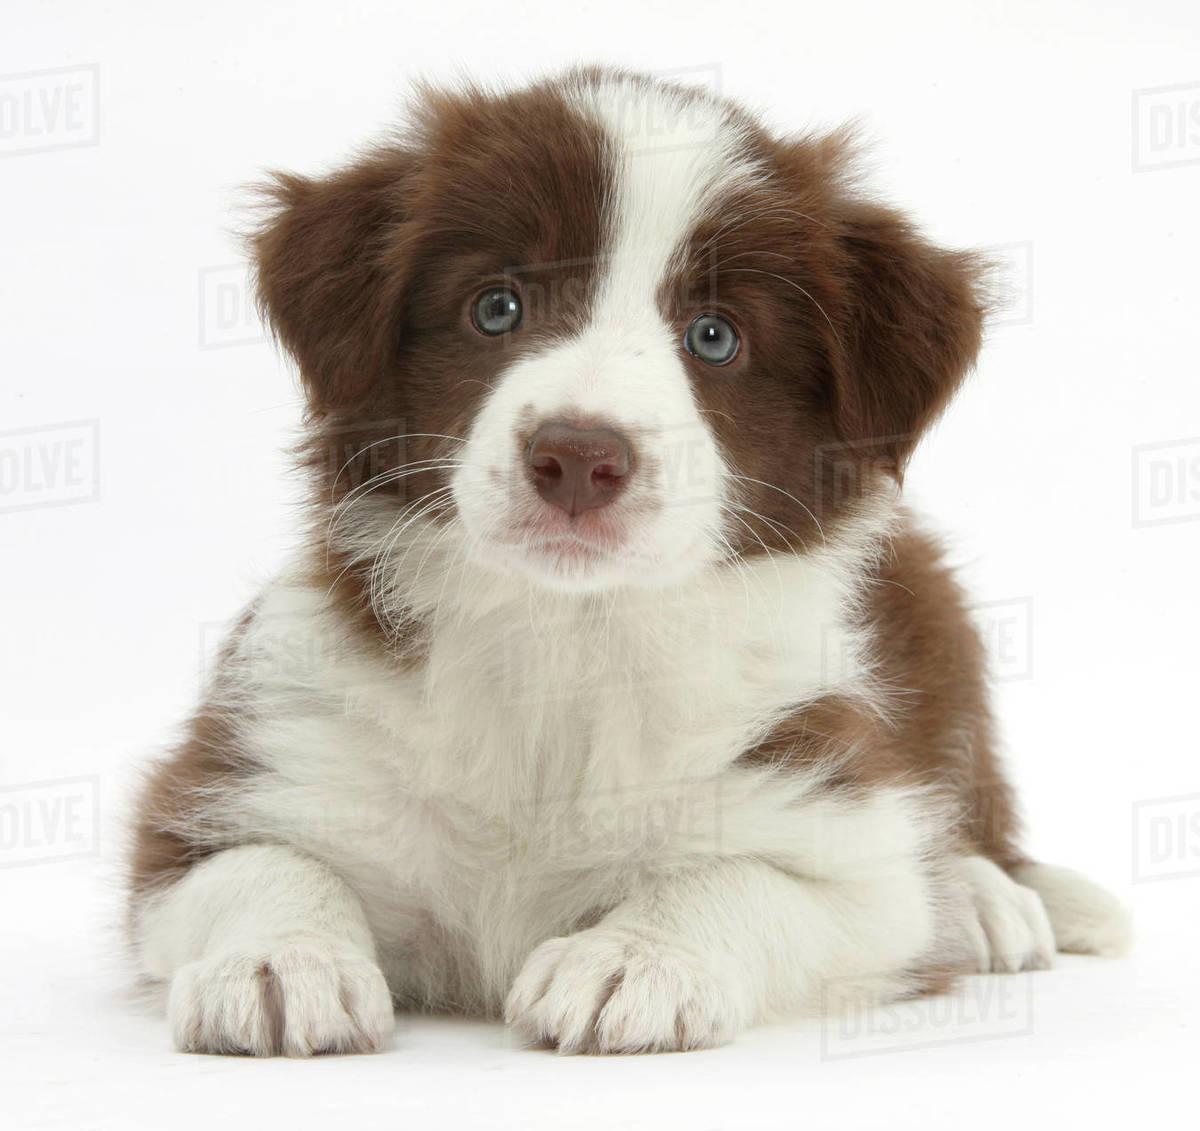 Chocolate Border Collie Puppy Age 7 Weeks Stock Photo Dissolve